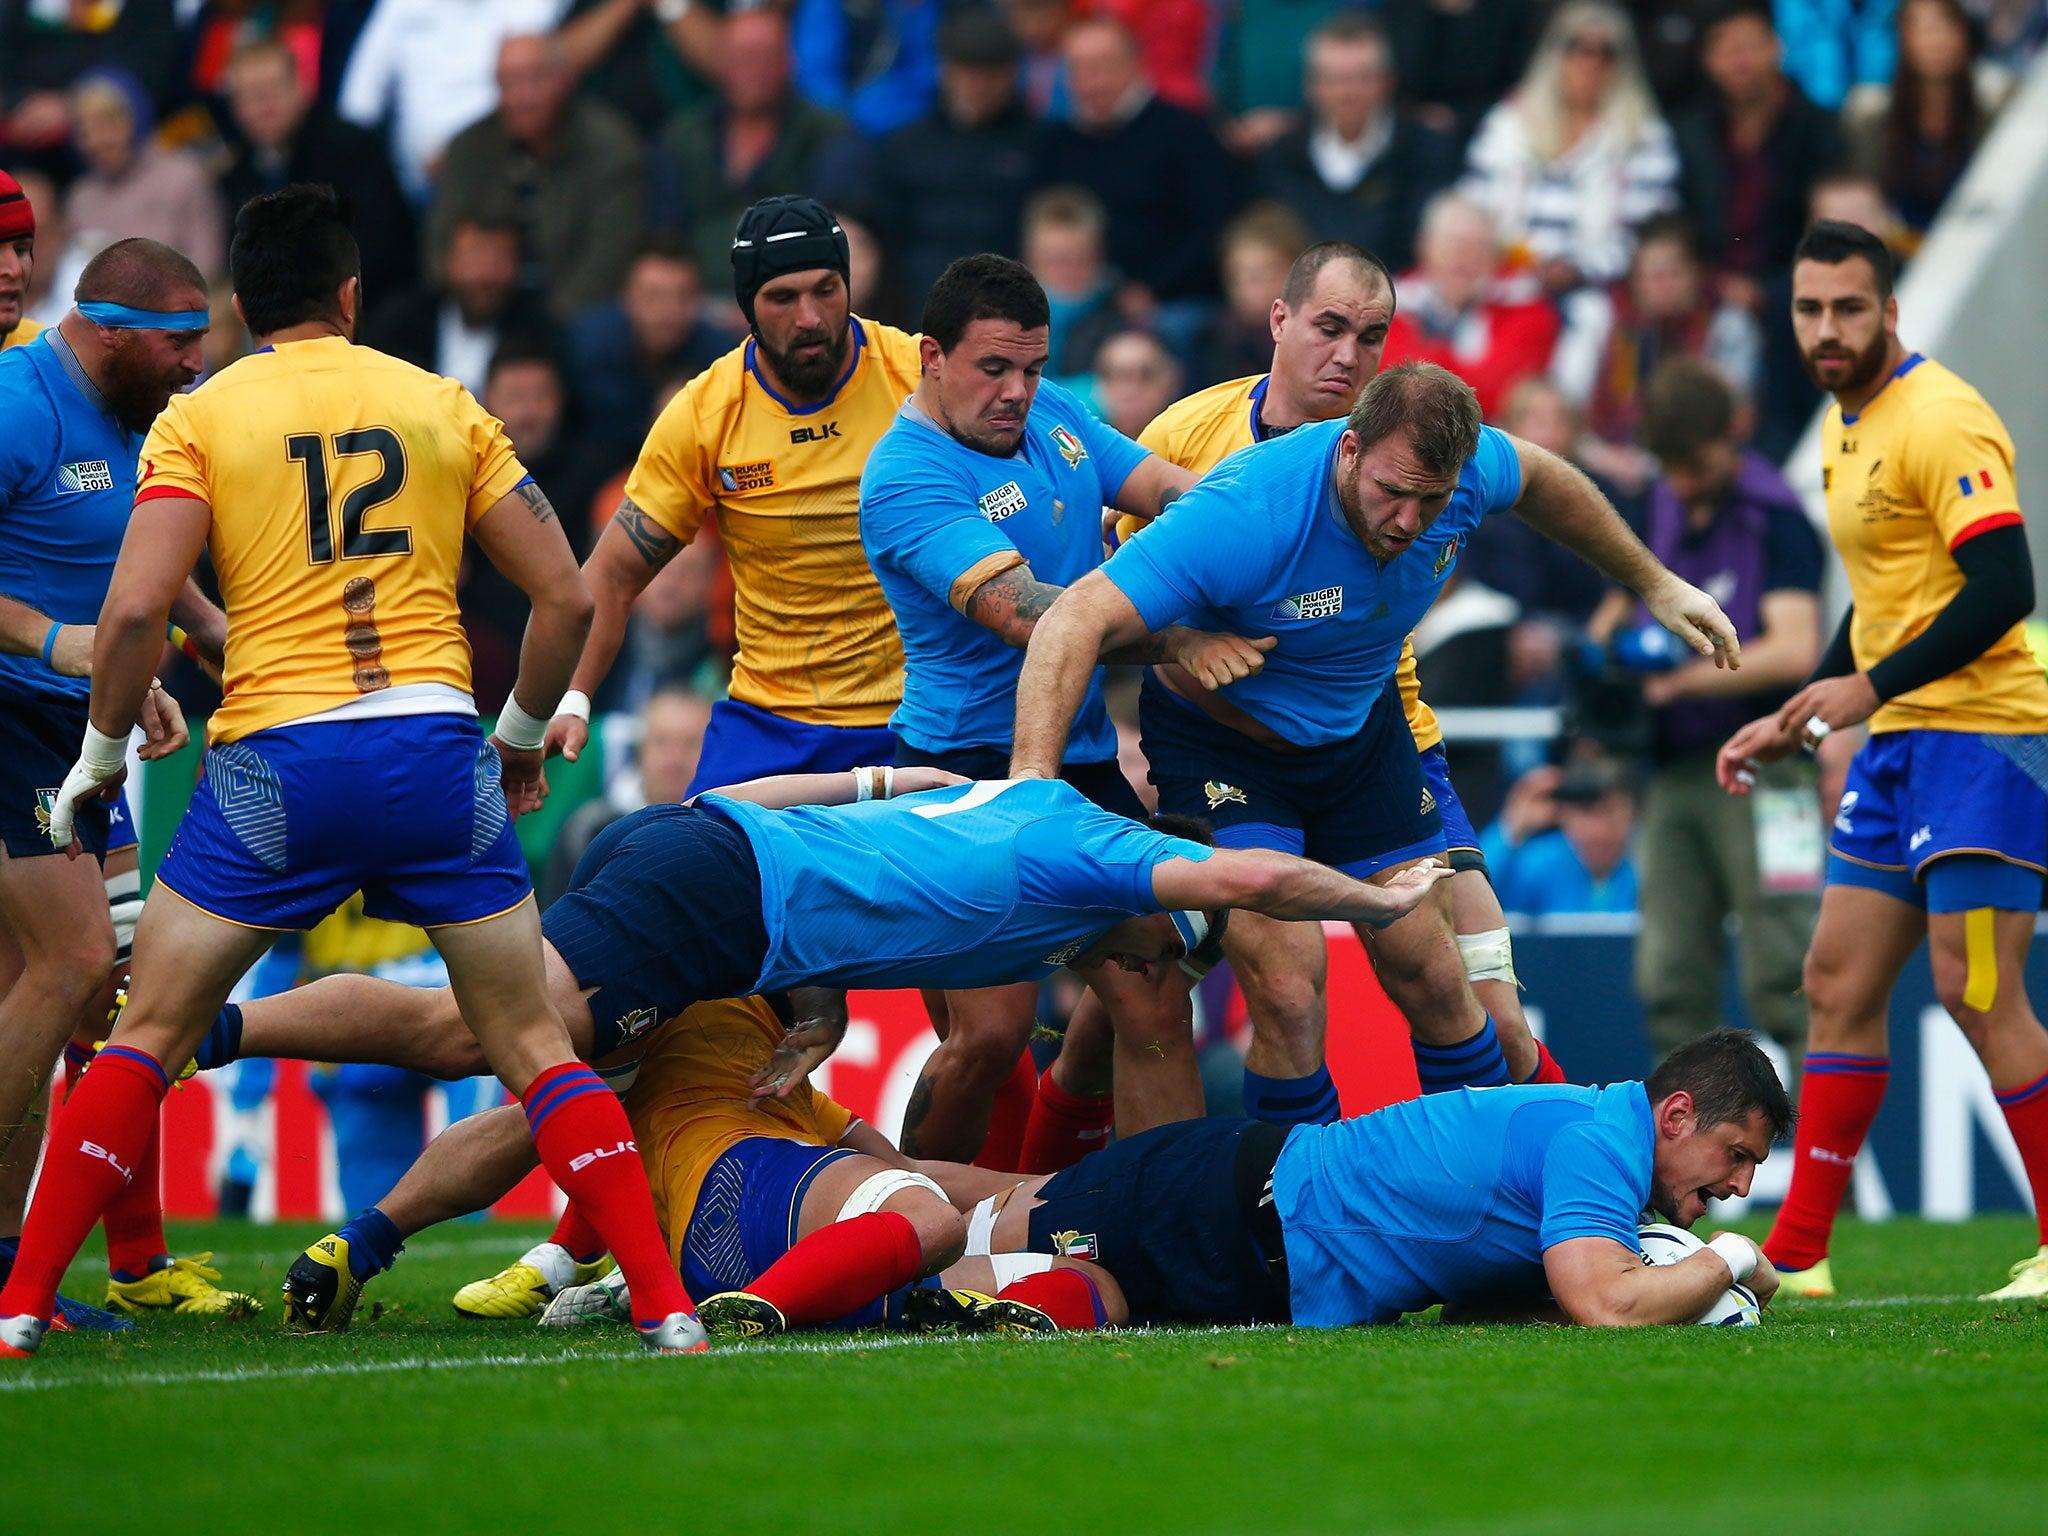 Italy vs Romania RWC 2015 match report: Azzurri secure 2019 Rugby